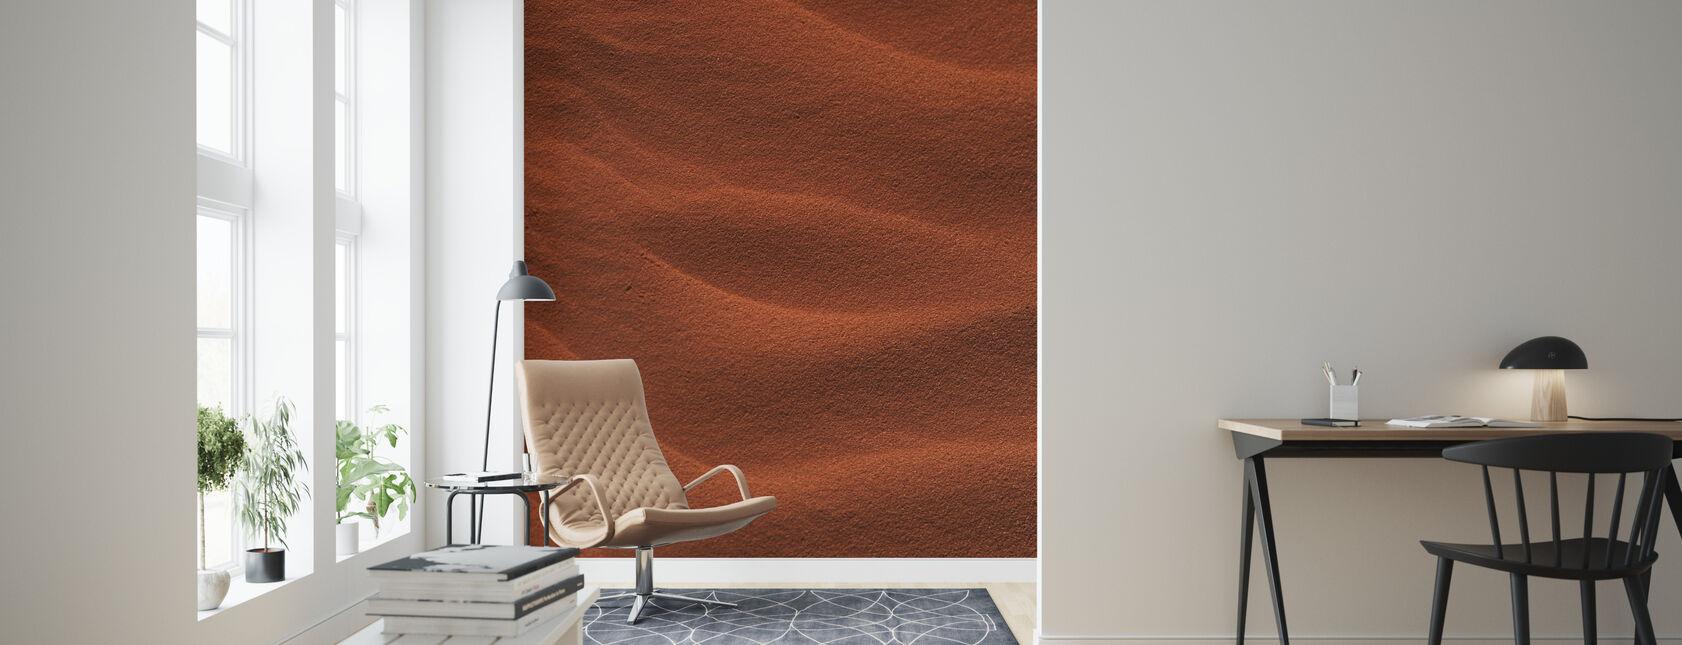 Red Rippled Sand - Wallpaper - Living Room